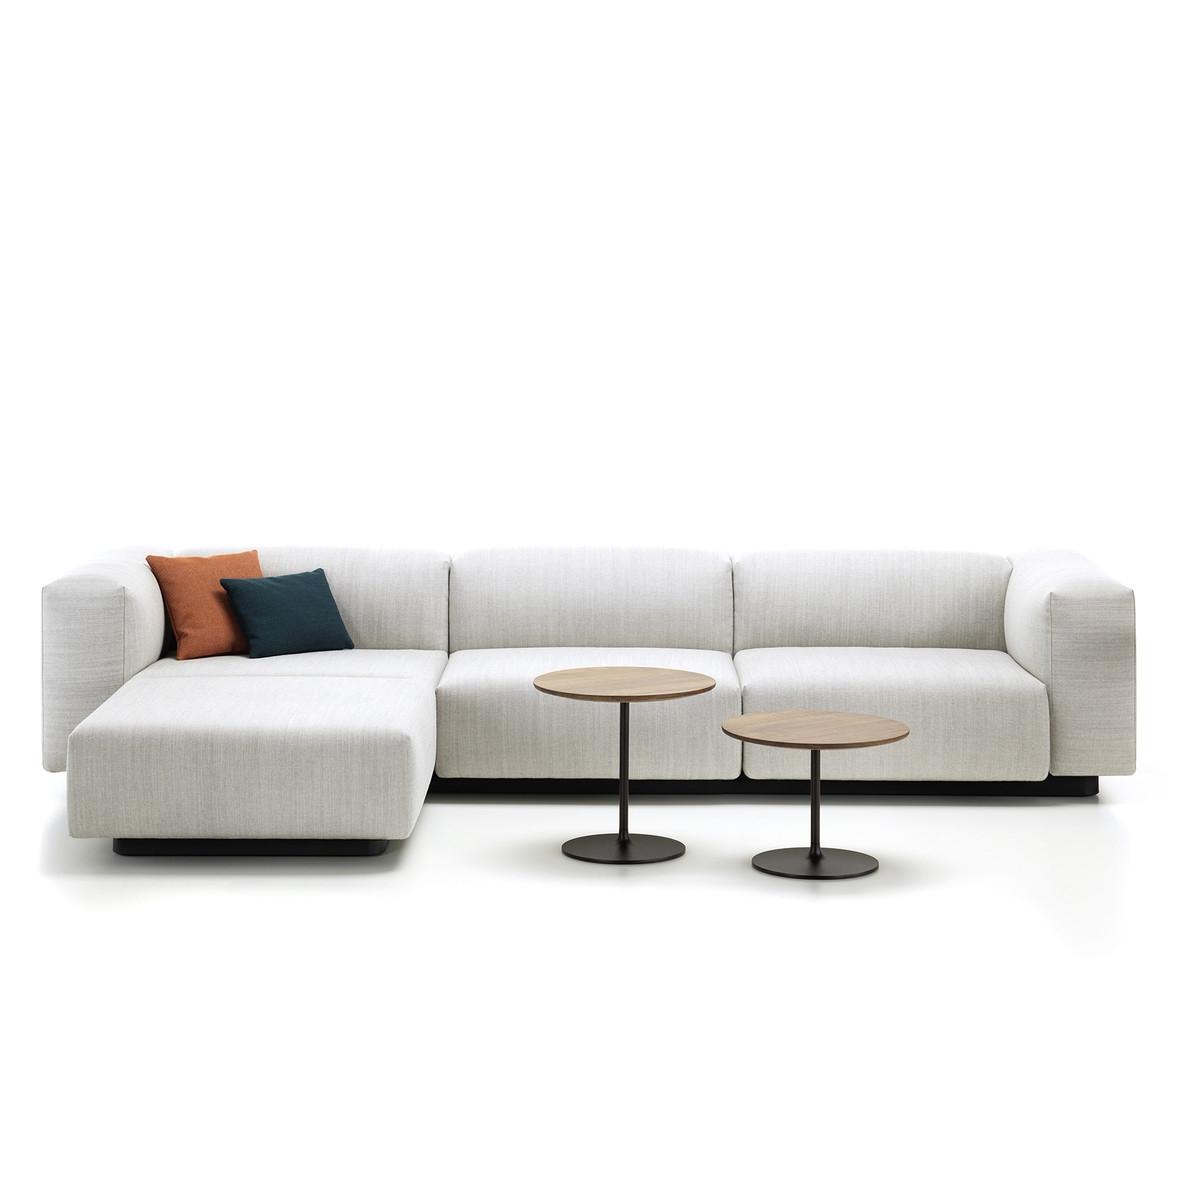 Buy The Soft Modular Corner Sofa From Vitra In Modular Corner Sofas (Image 2 of 15)